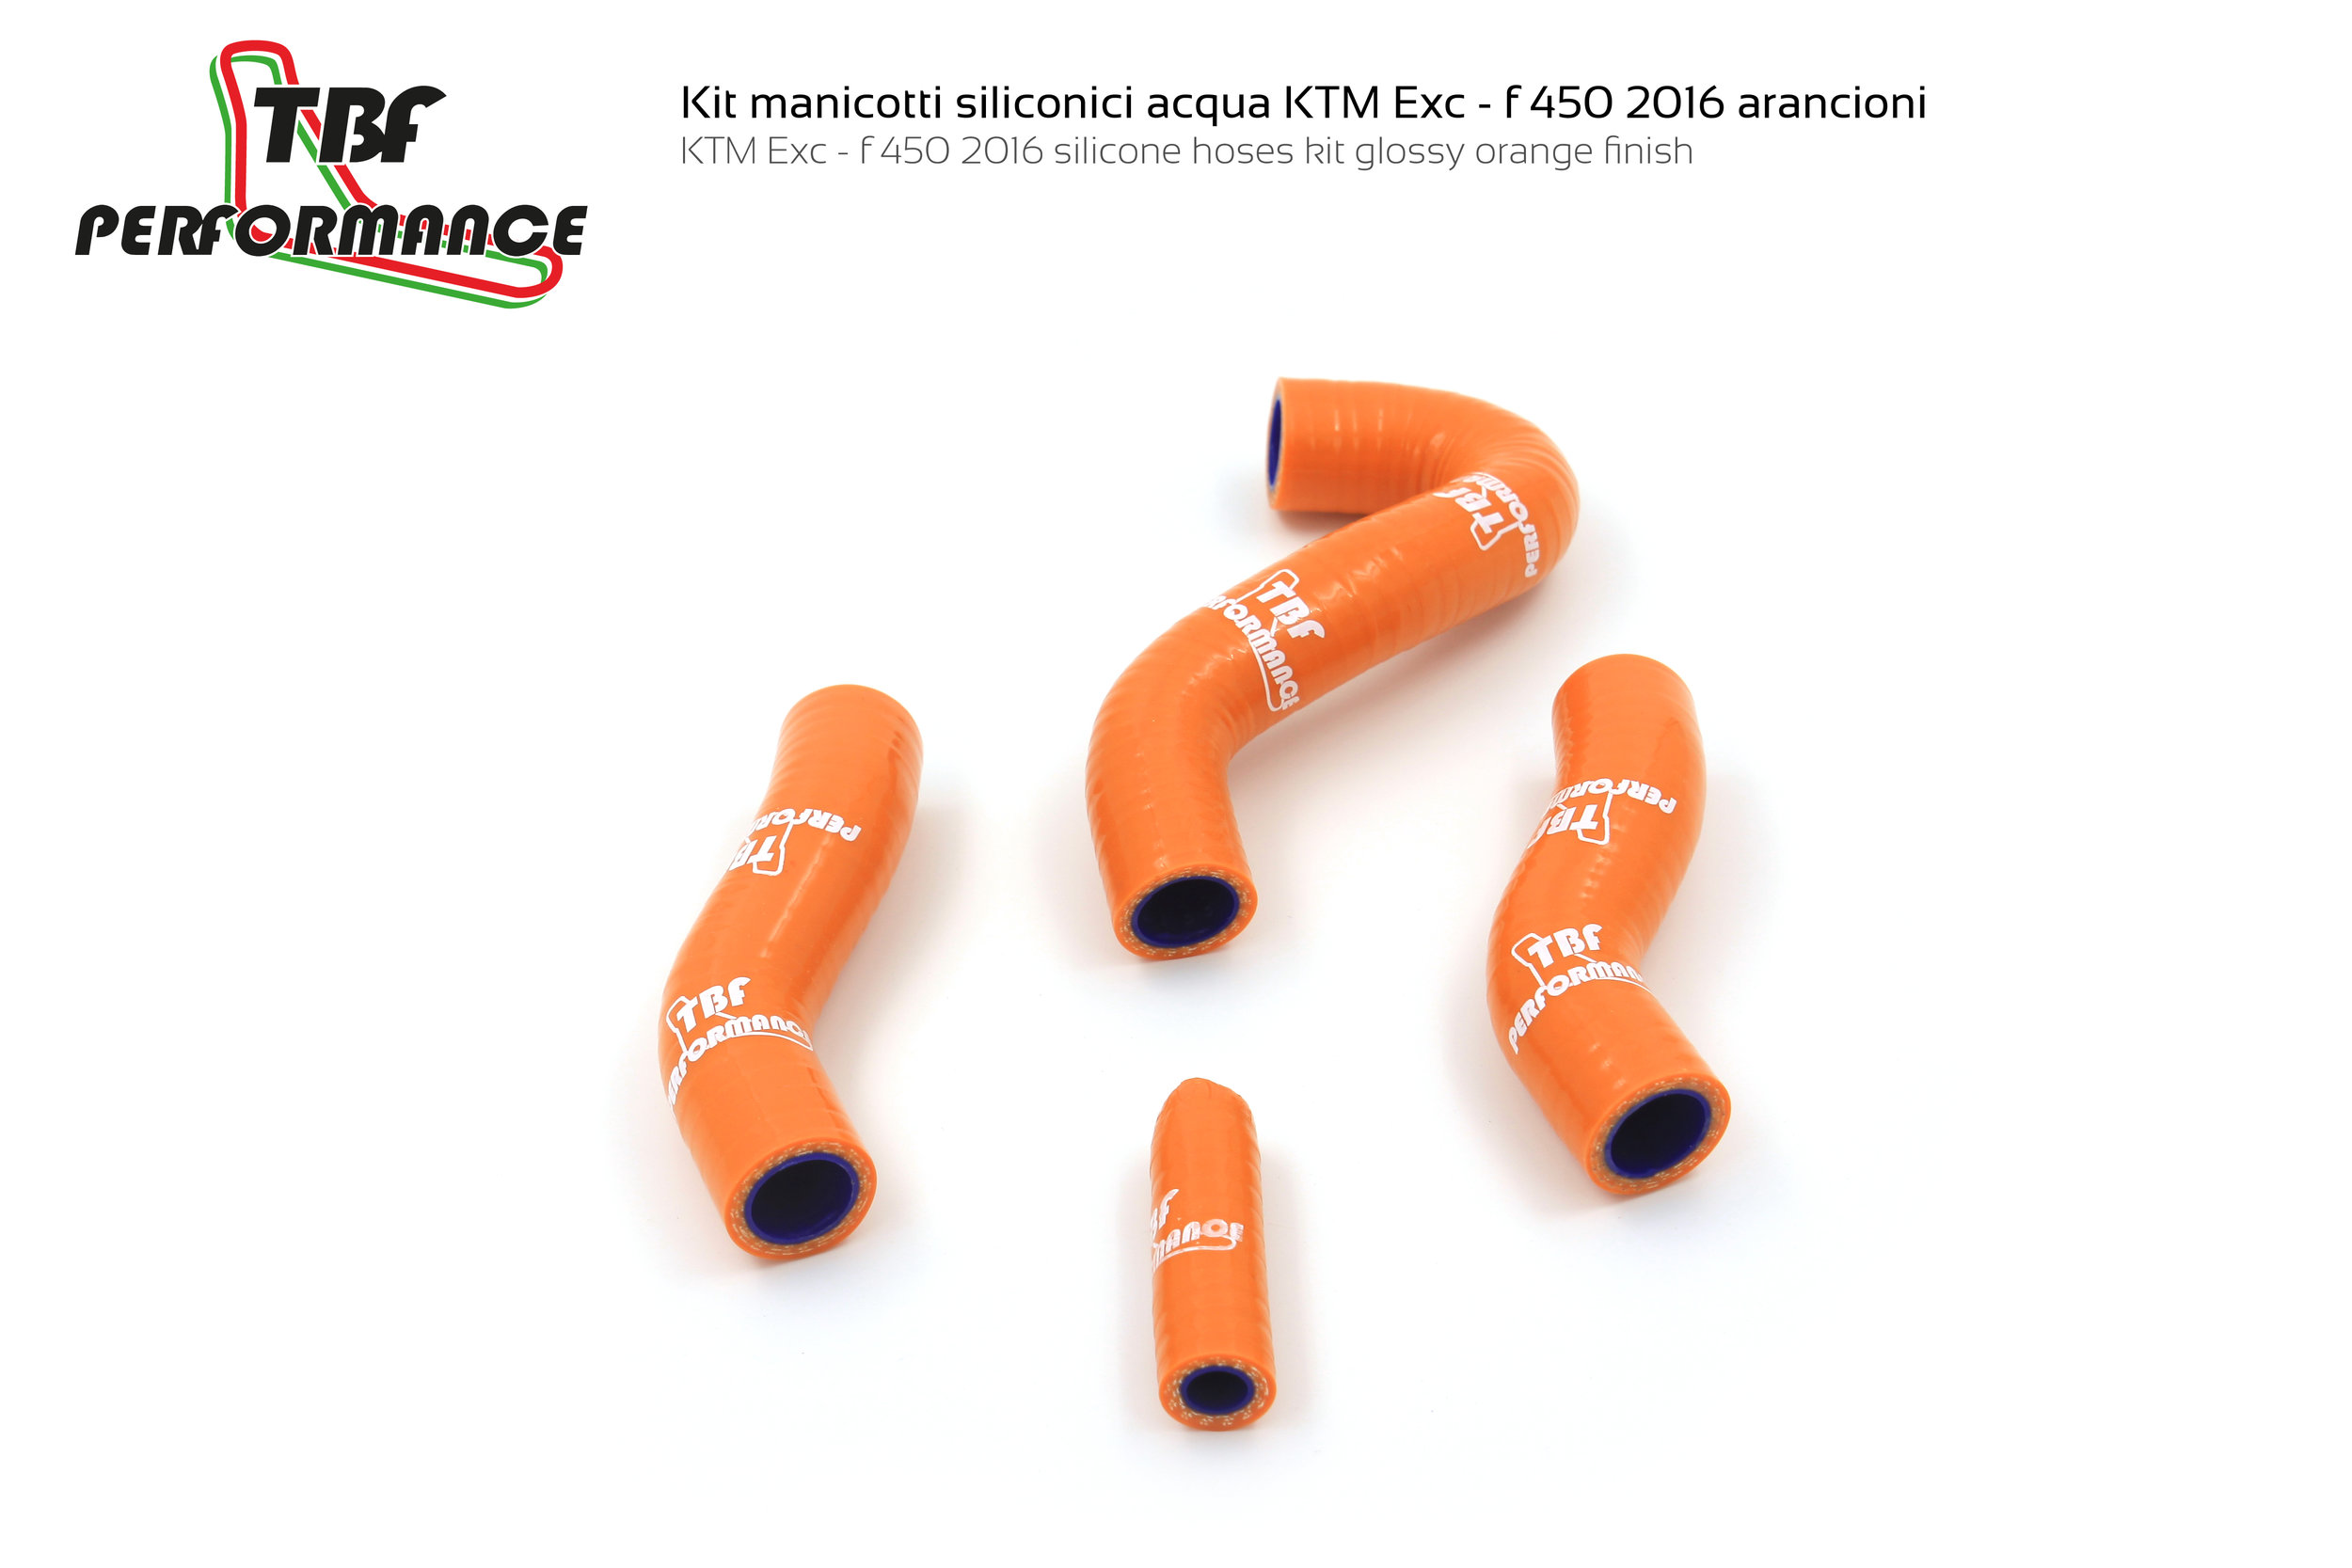 KTM45016arancio.jpg